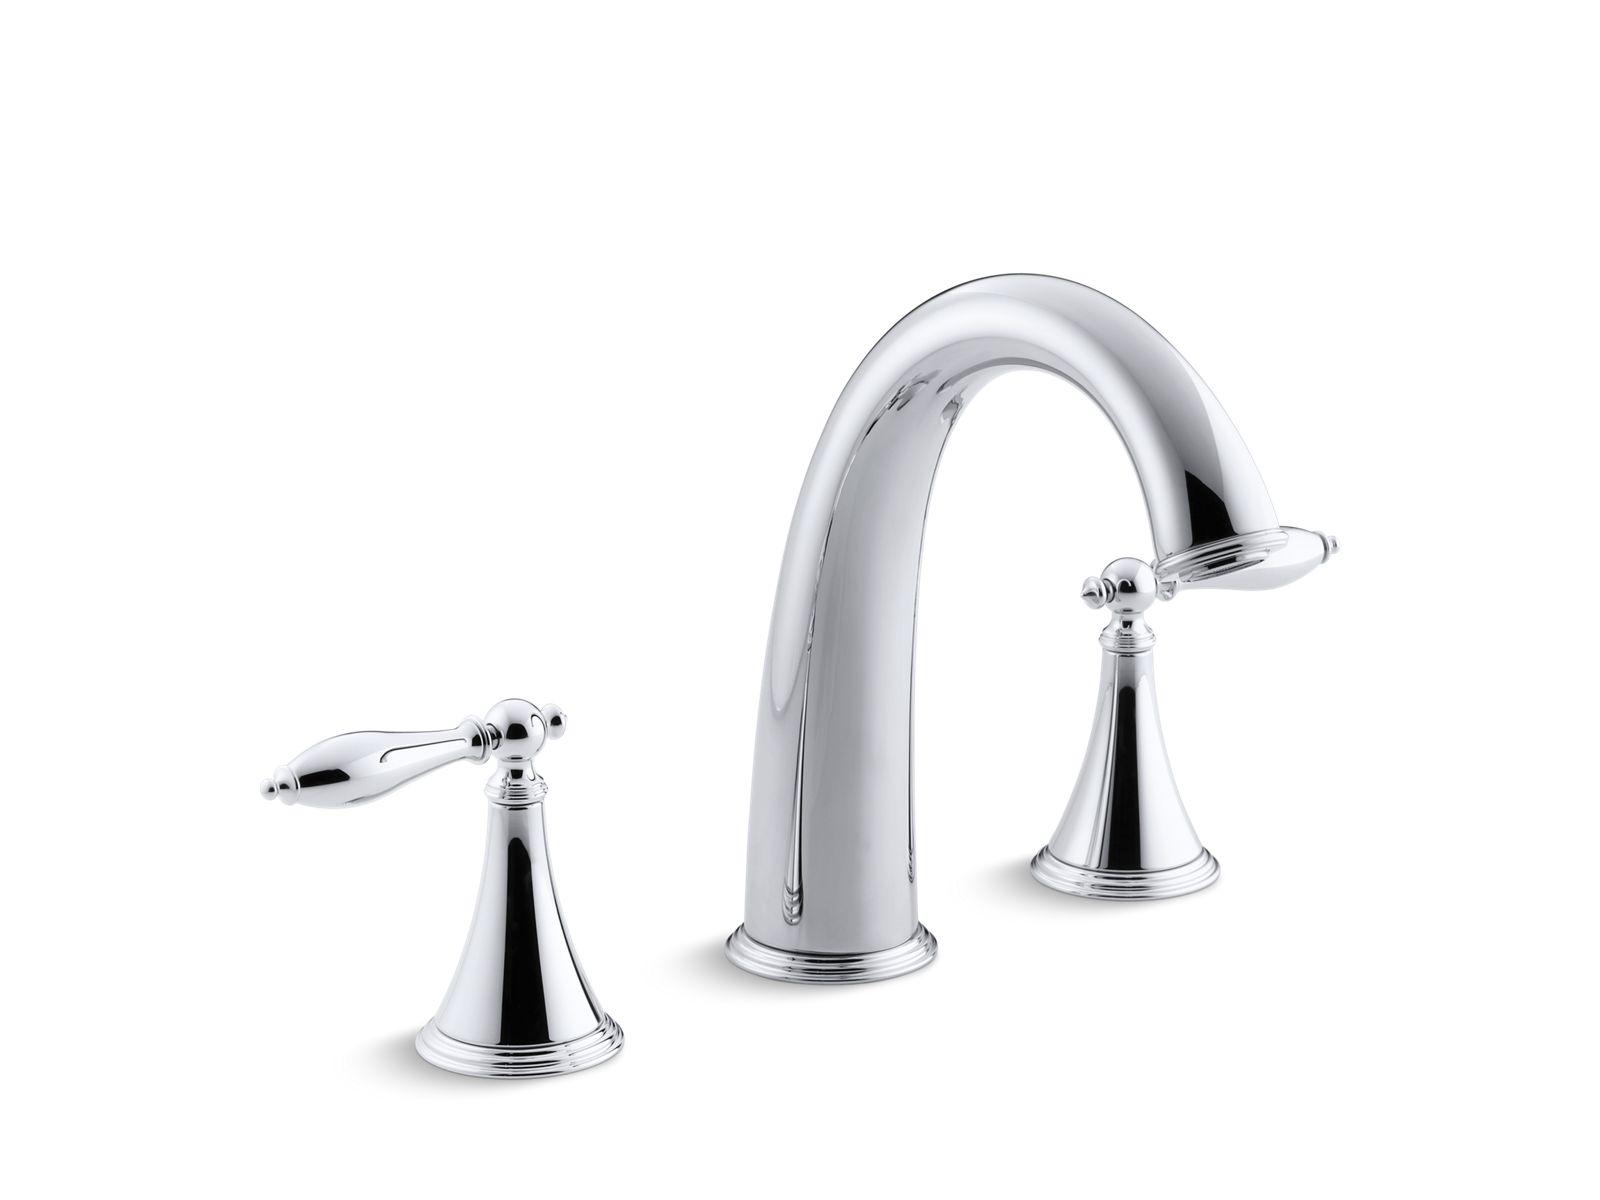 finial traditional deckmount highflow bath faucet trim kt3144m kohler - Kohler Bathroom Faucets